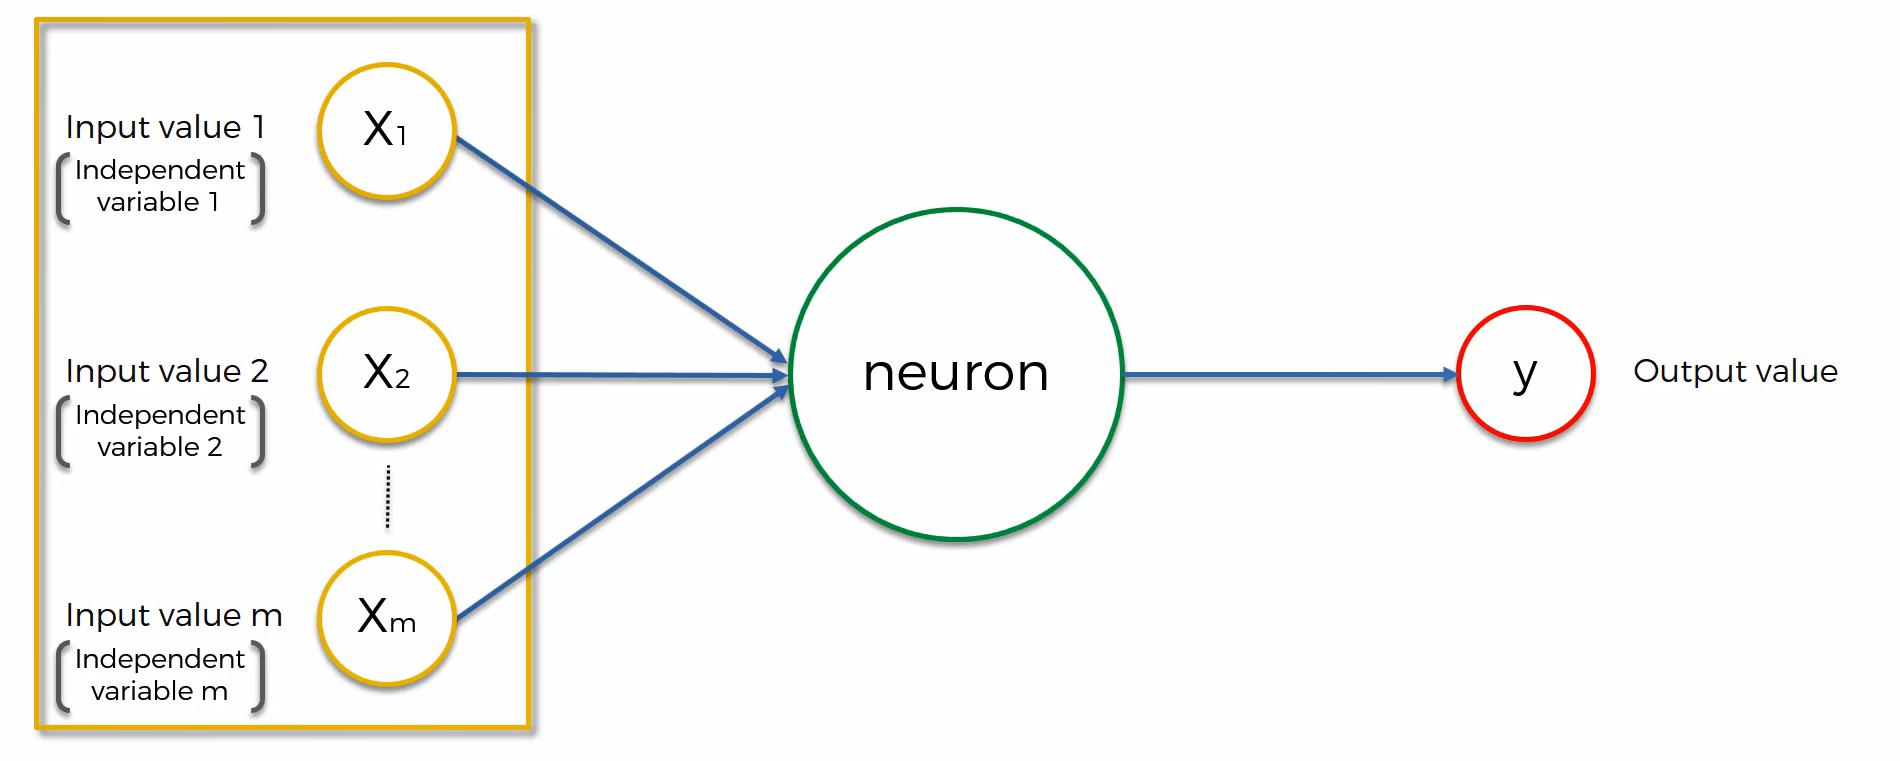 Maschinenlernen. Deep Learning. Künstliche Neuronale Netzwerke. Einführung Schritt 2